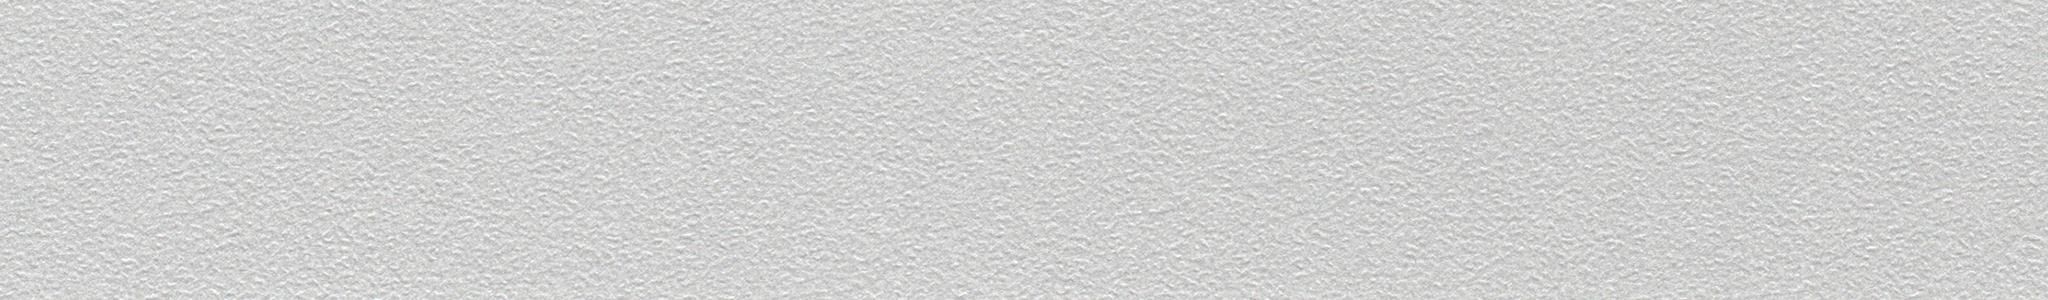 HD 49509 ламинированная кромка алюминий жемчуг